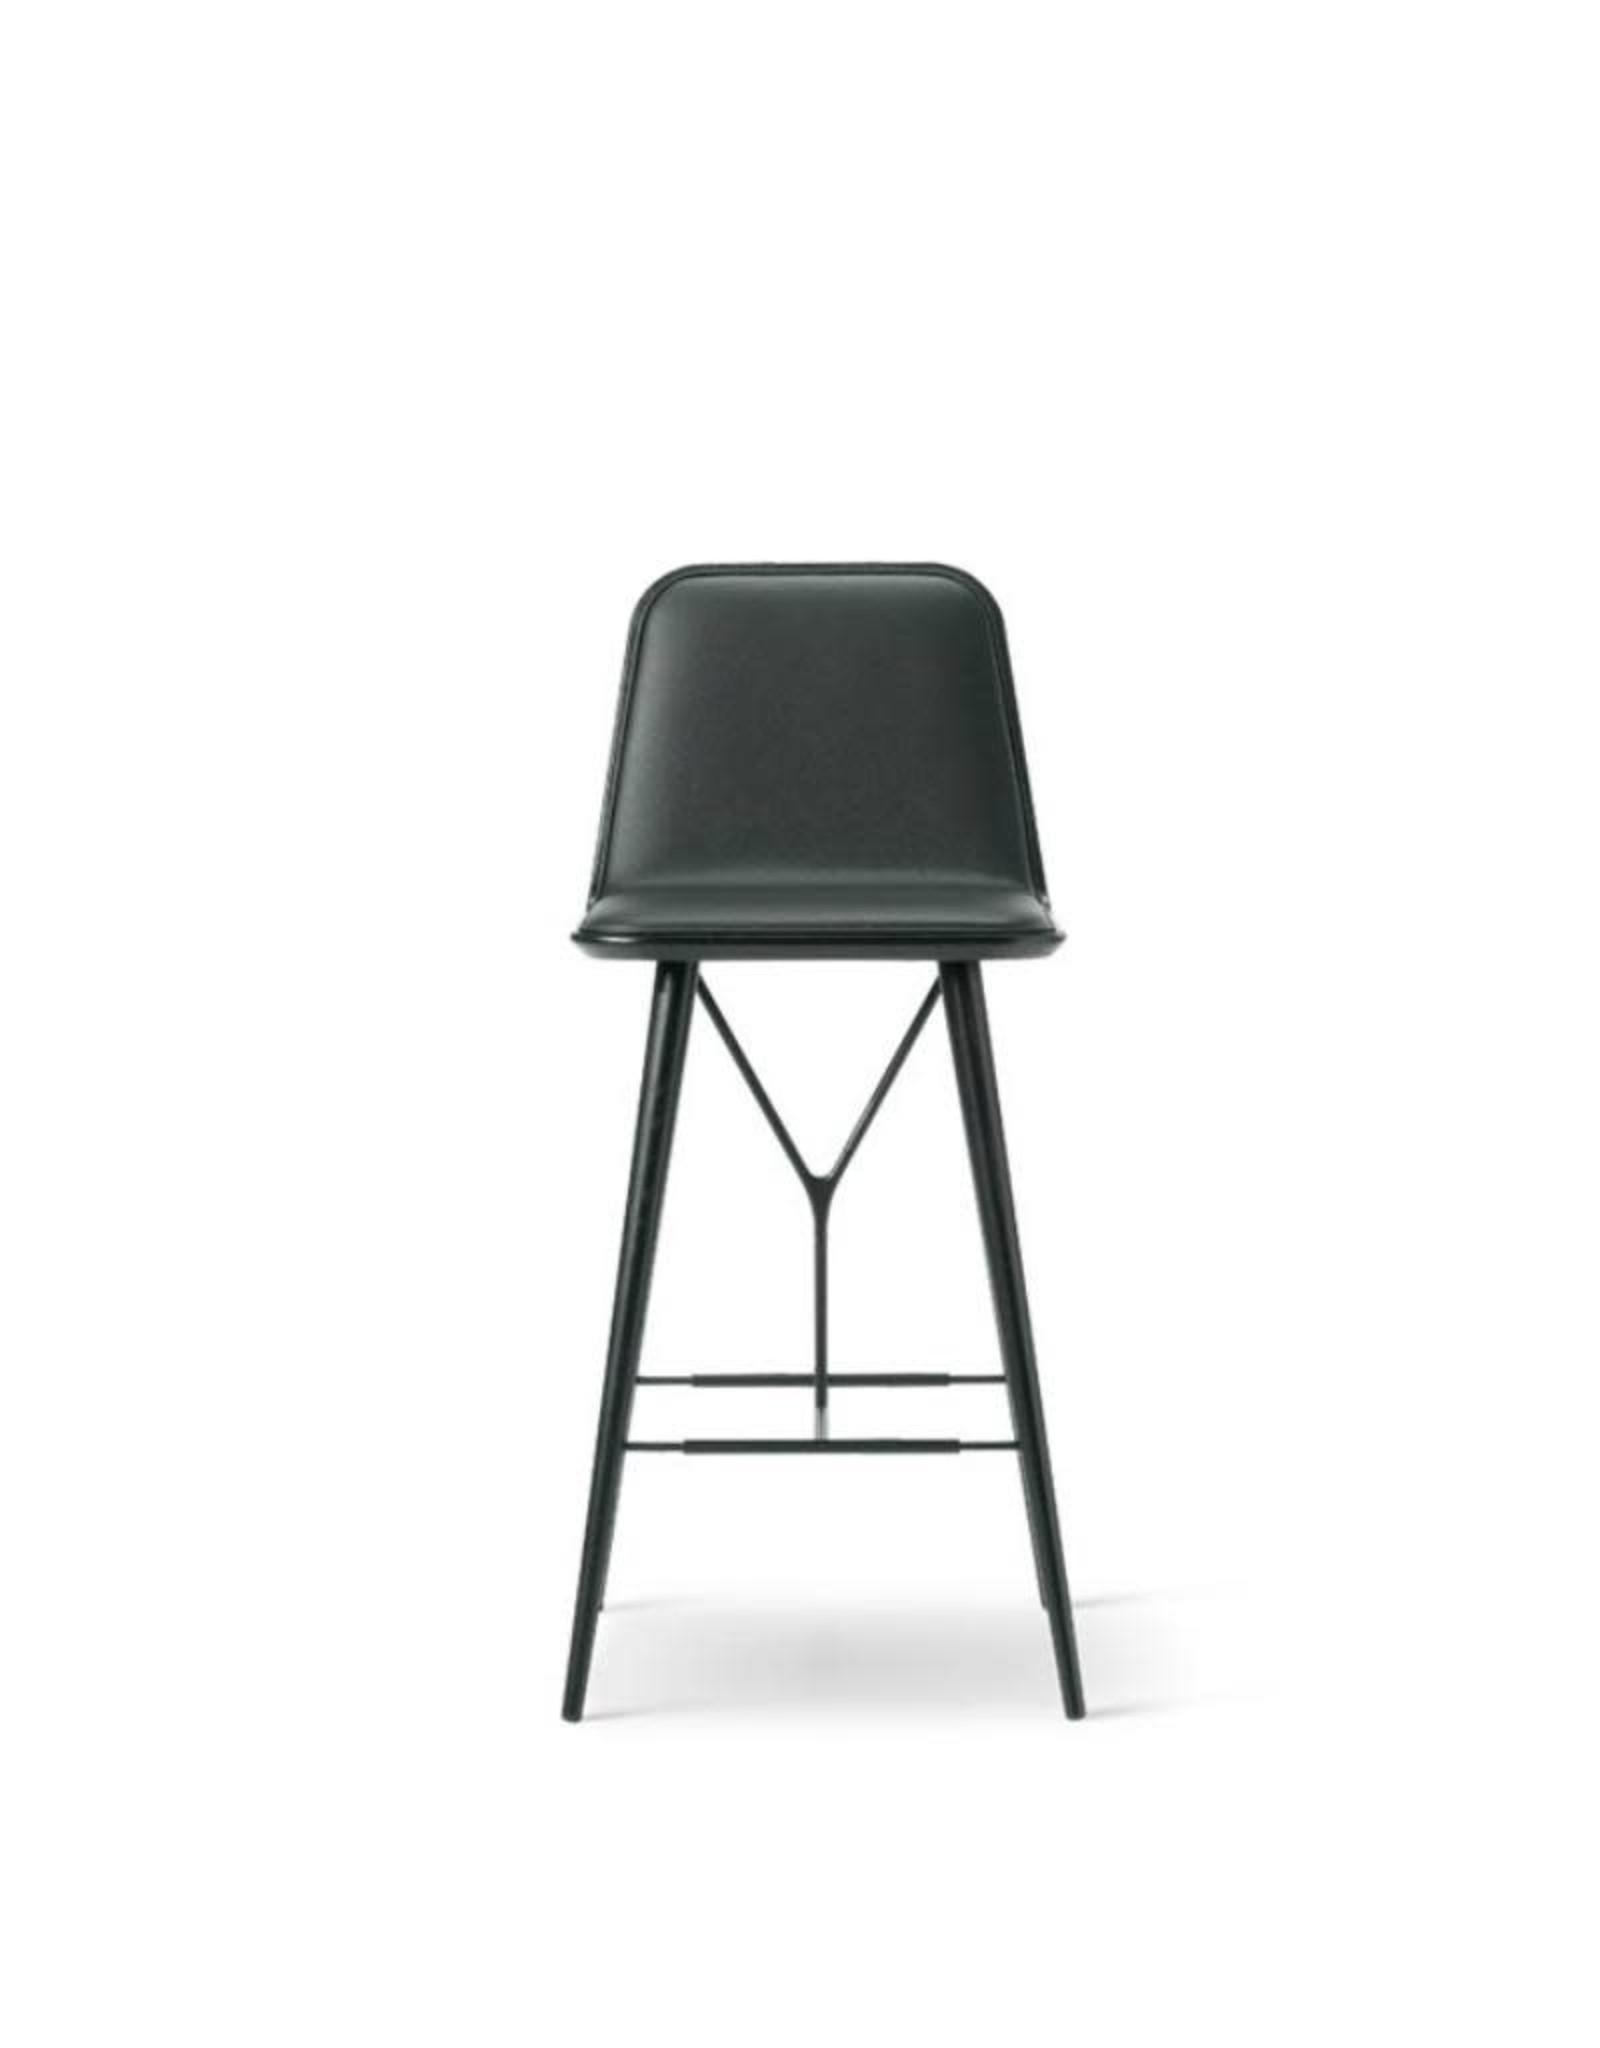 1731 SPINE 木底座靠背吧椅